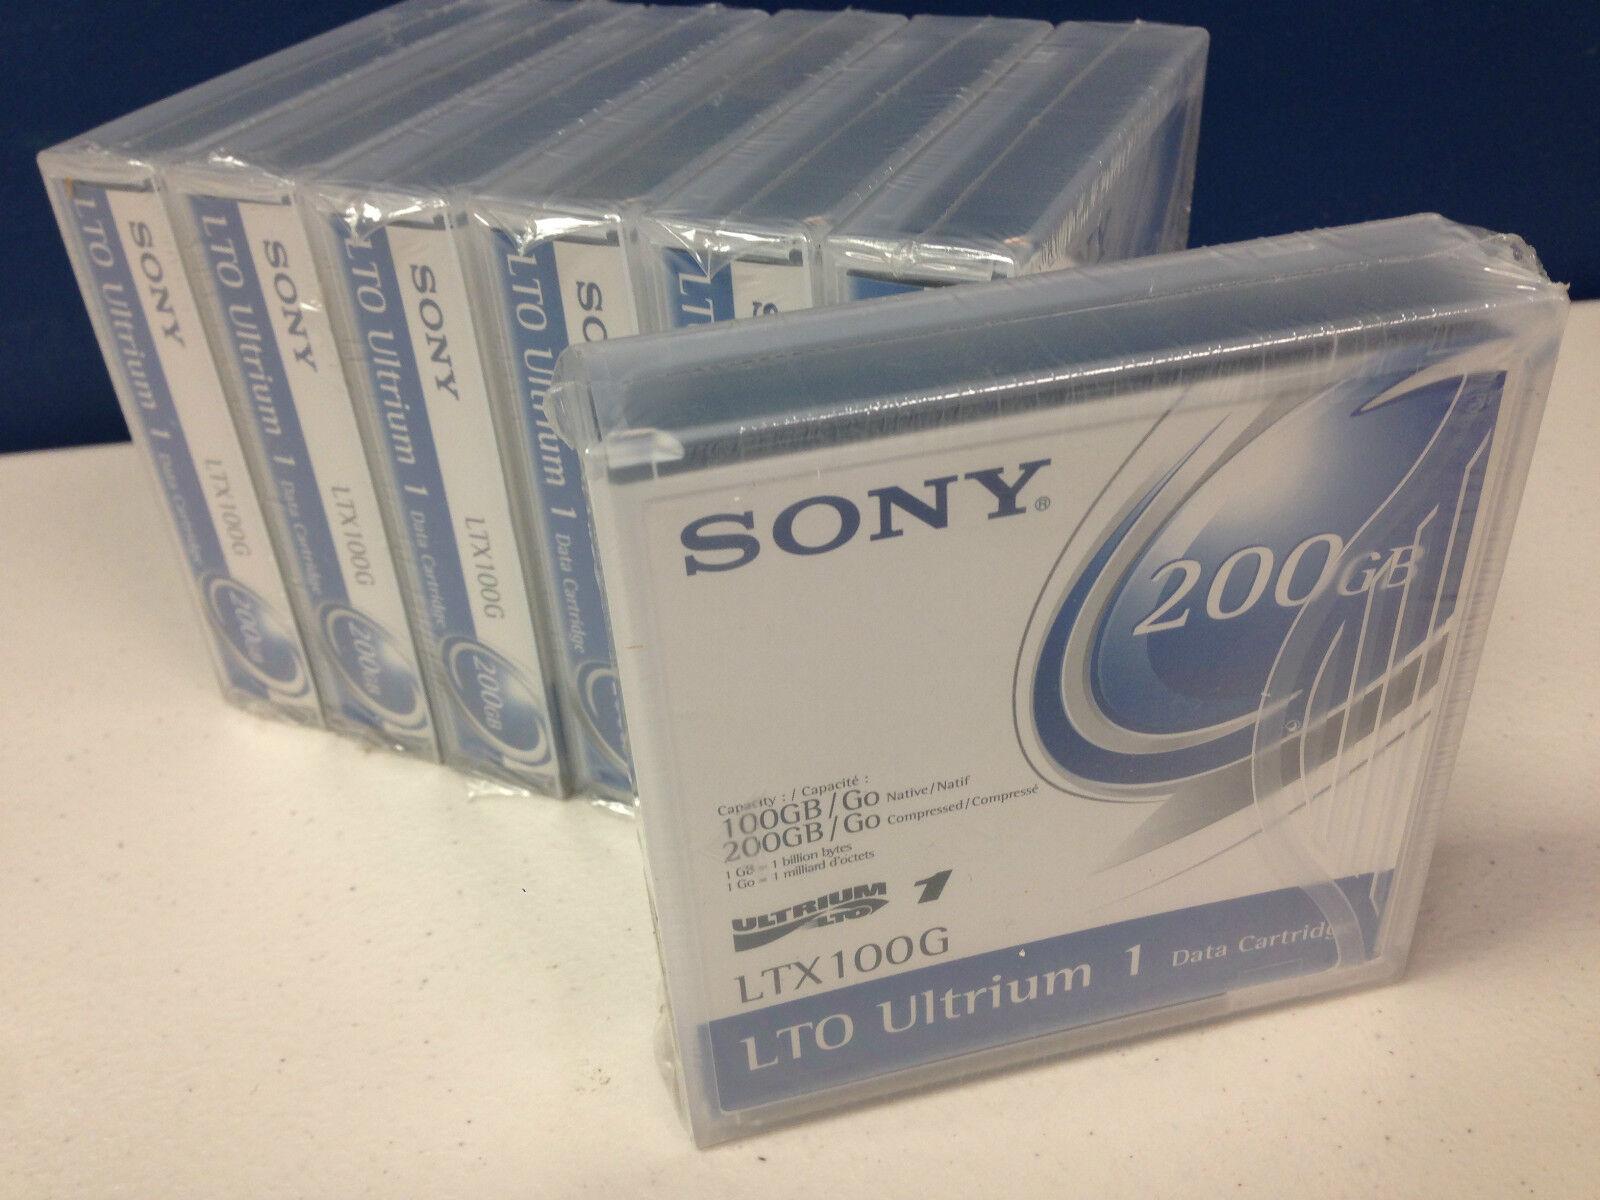 Sony LTO1 100G//200G Compressed LTX100G 5 Pack